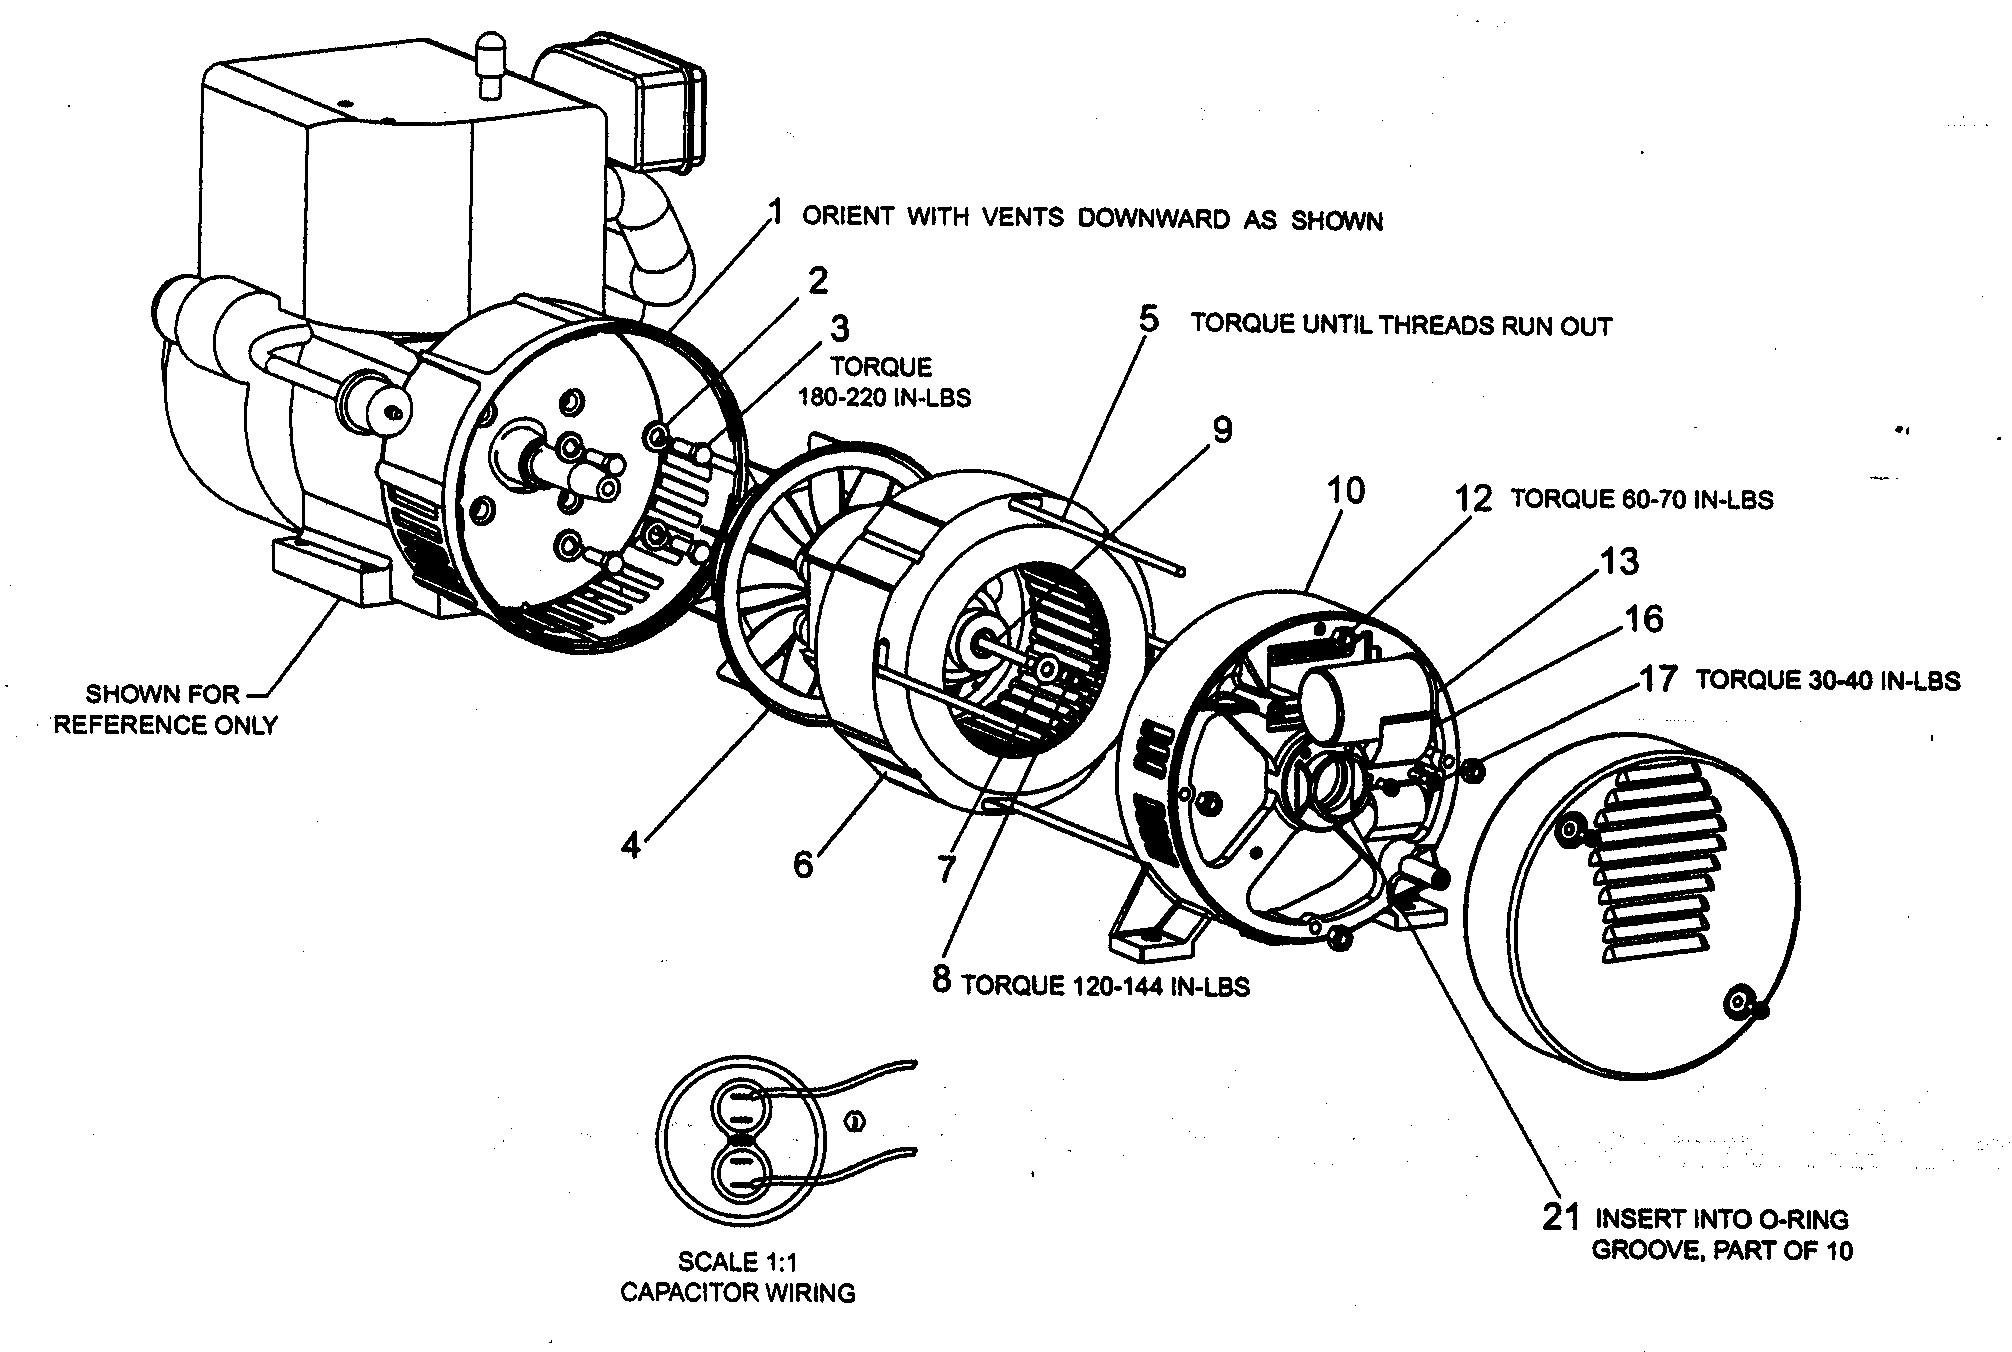 Honda Engine Parts Diagram Craftsman Generator Parts Model Of Honda Engine Parts Diagram